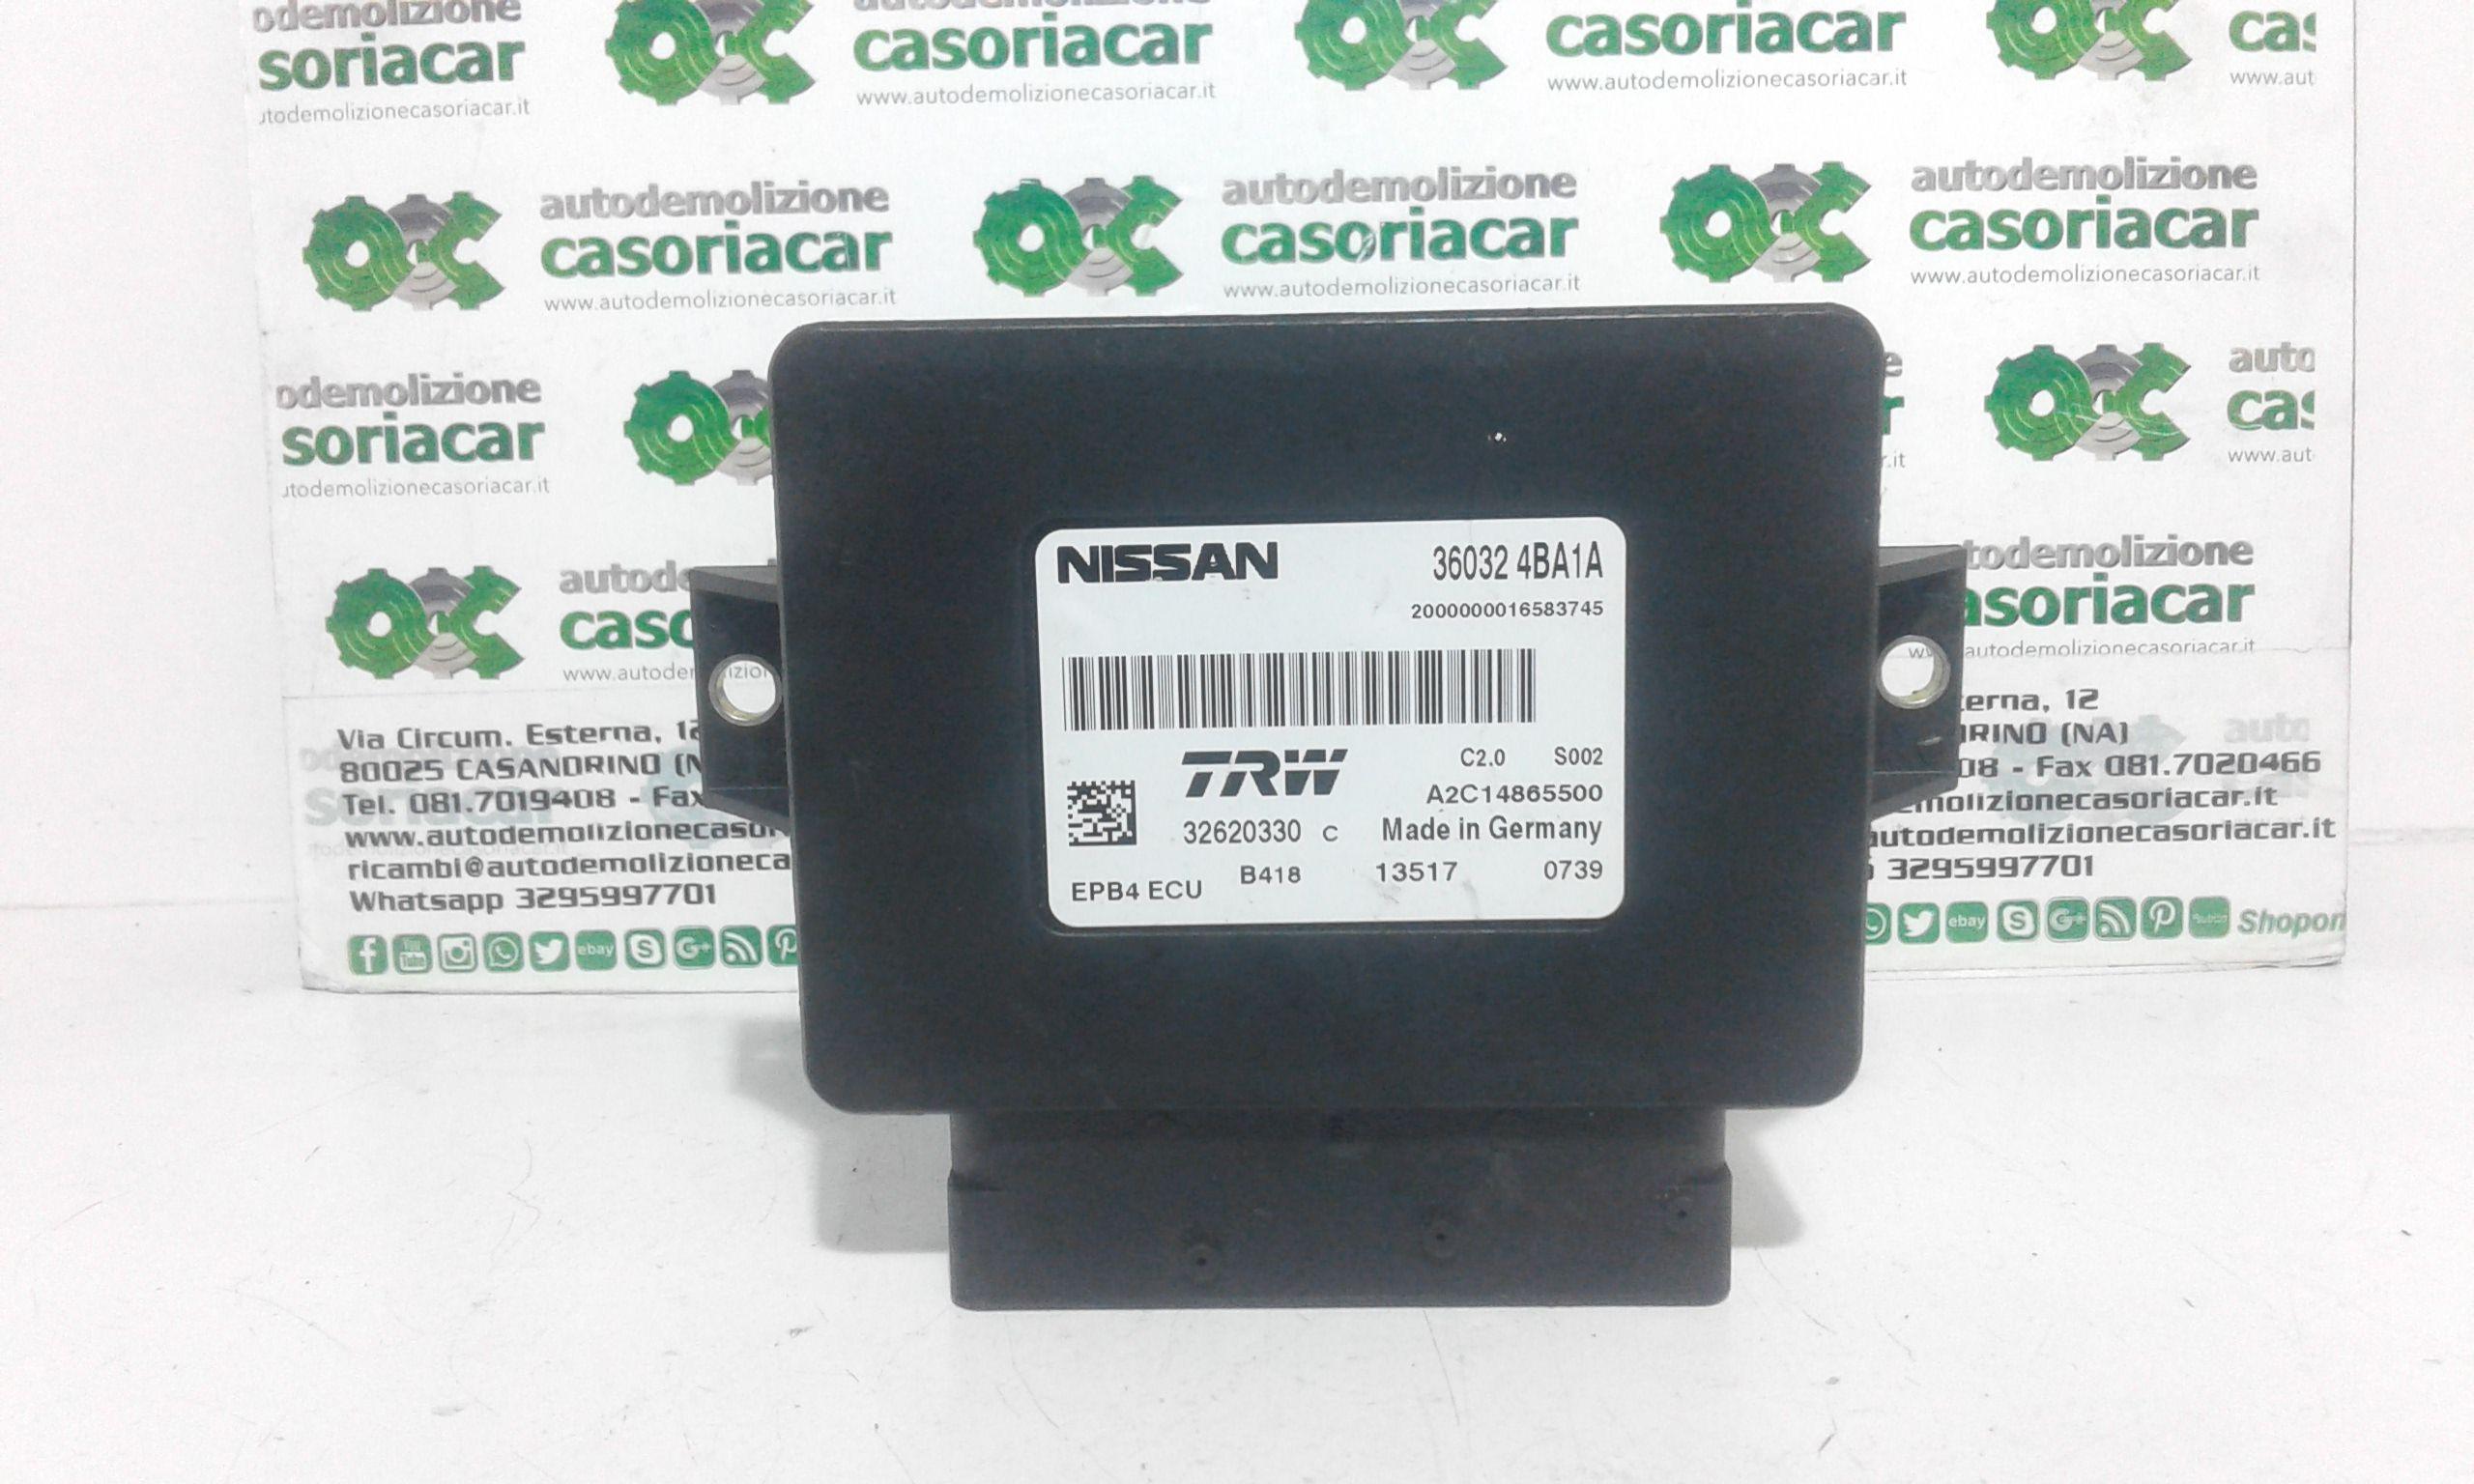 32620330 CENTRALINA PARK ASSIST NISSAN Qashqai Serie 1500 Diesel k9k (2017) RICAMBI USATI